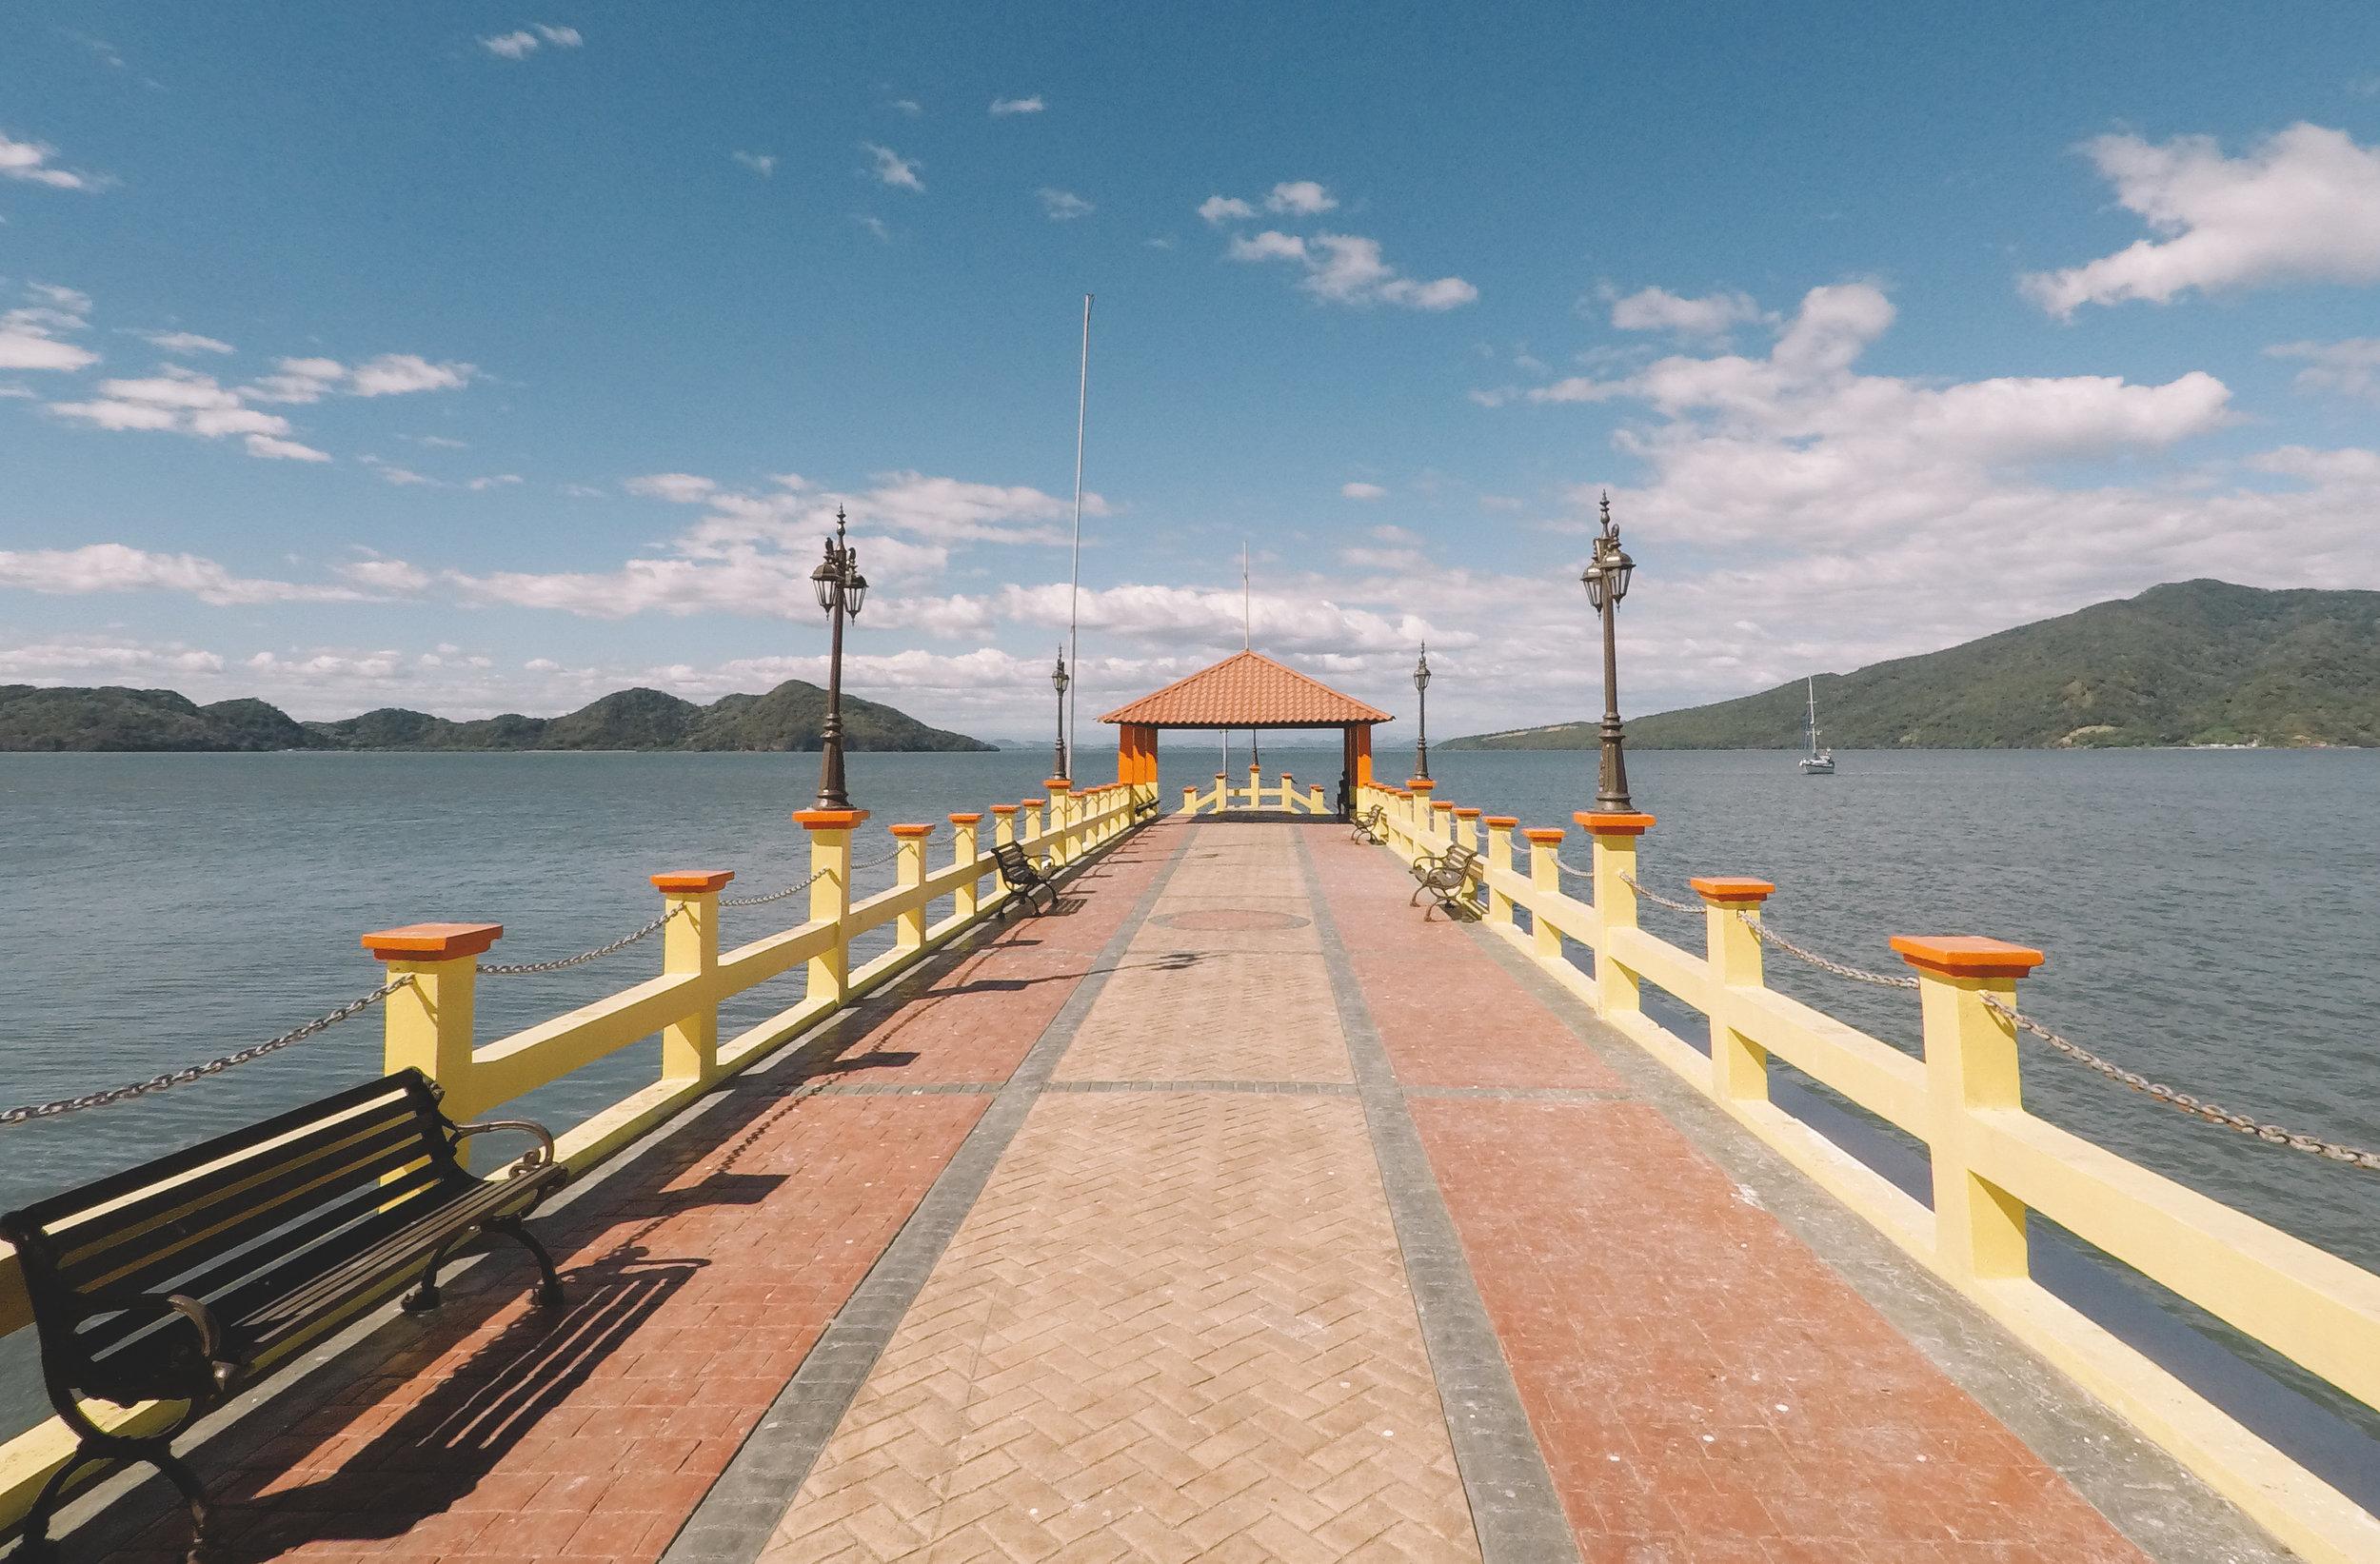 Agape anchored off the pier at El Tigre.